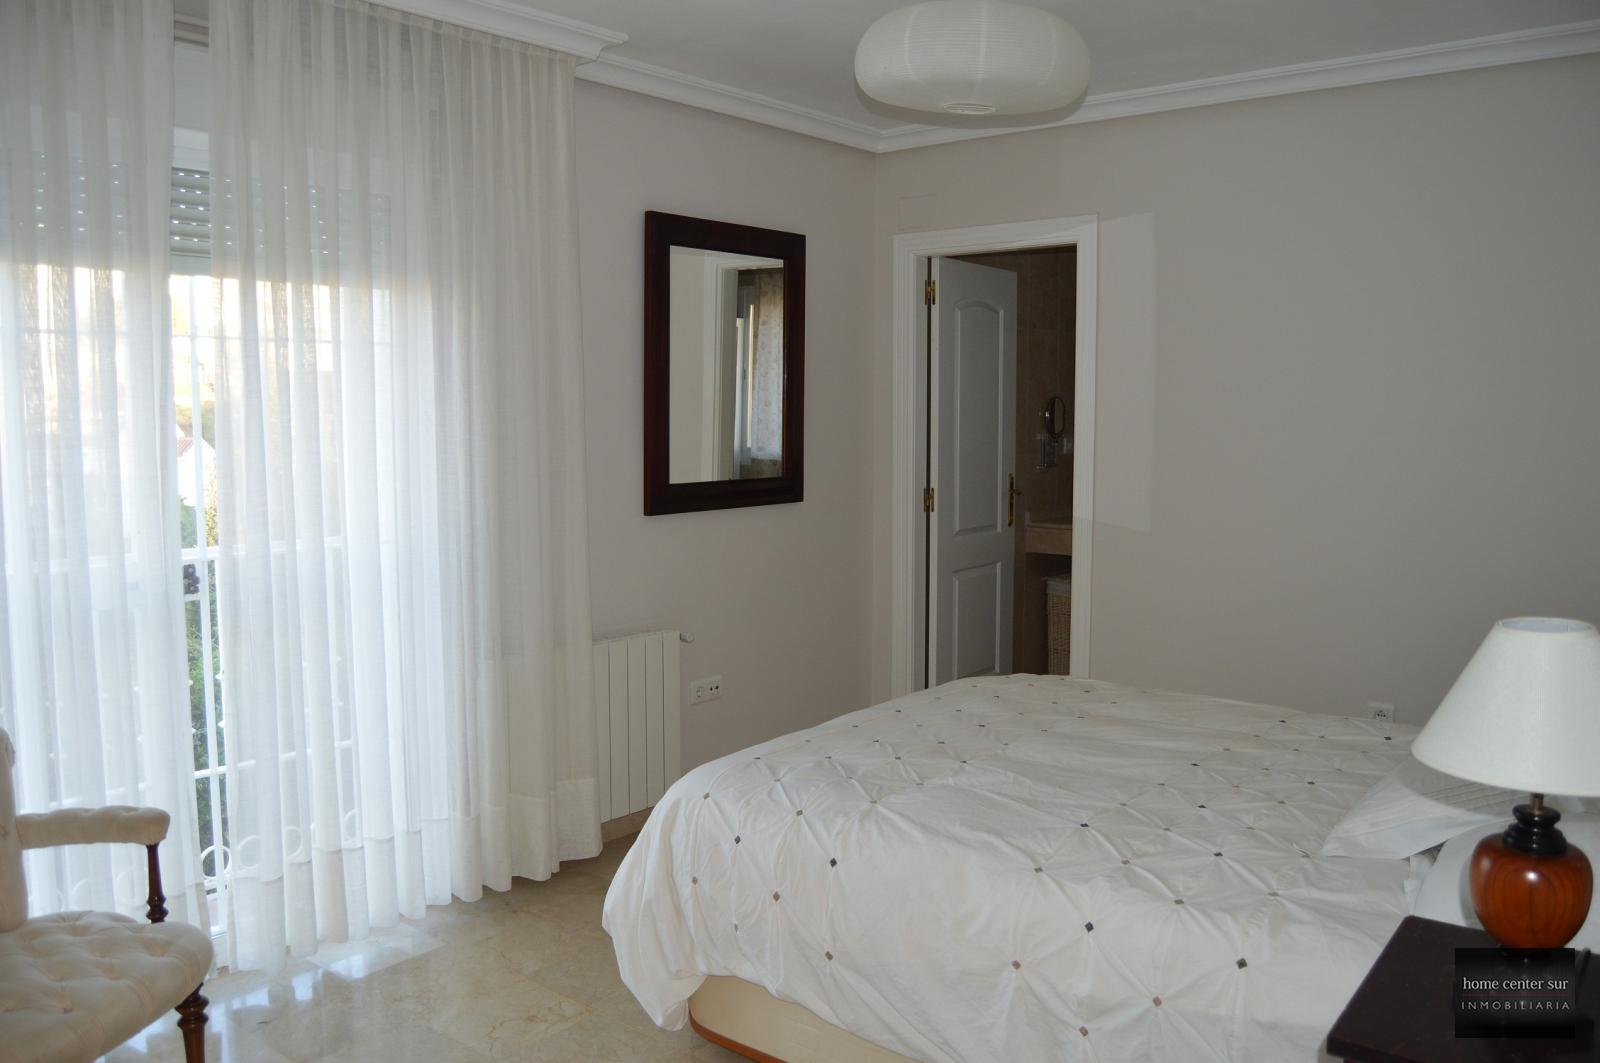 Chalet en venta en Avenida Mare Nostrum (Fuengirola), 419.900 €